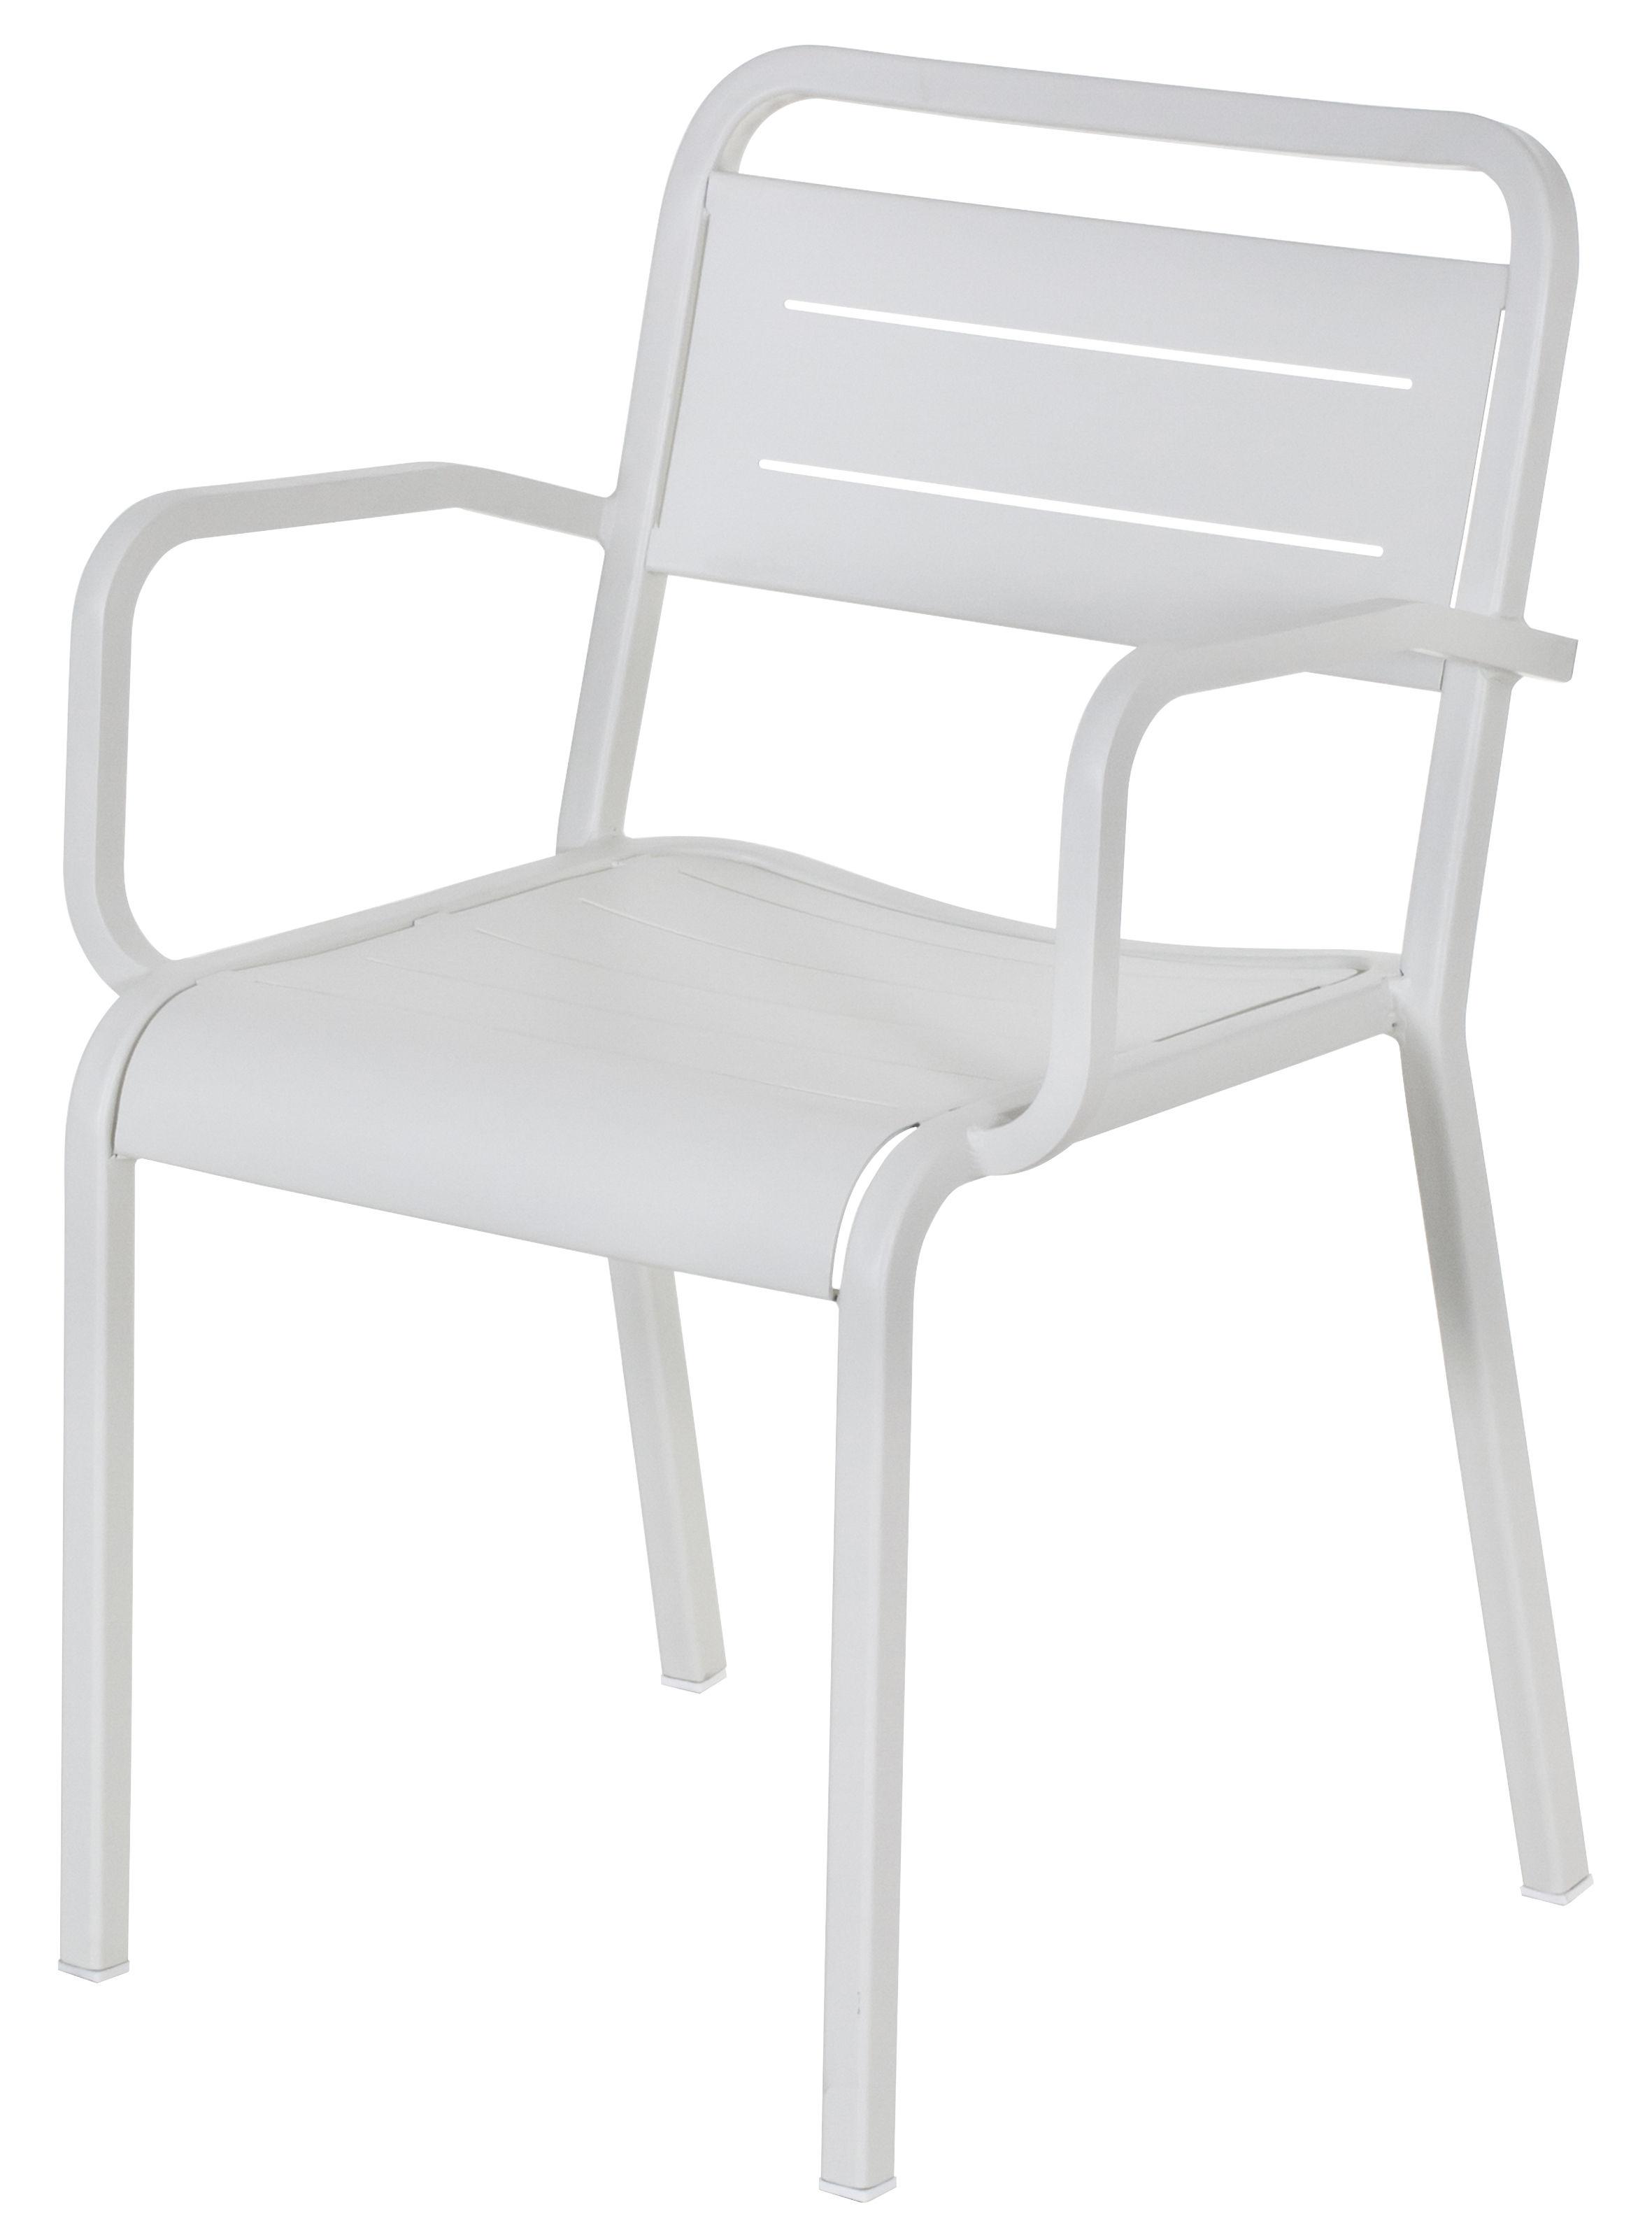 Möbel - Stühle  - Urban Stapelbarer Sessel - Emu - Weiß - klarlackbeschichtetes Aluminium